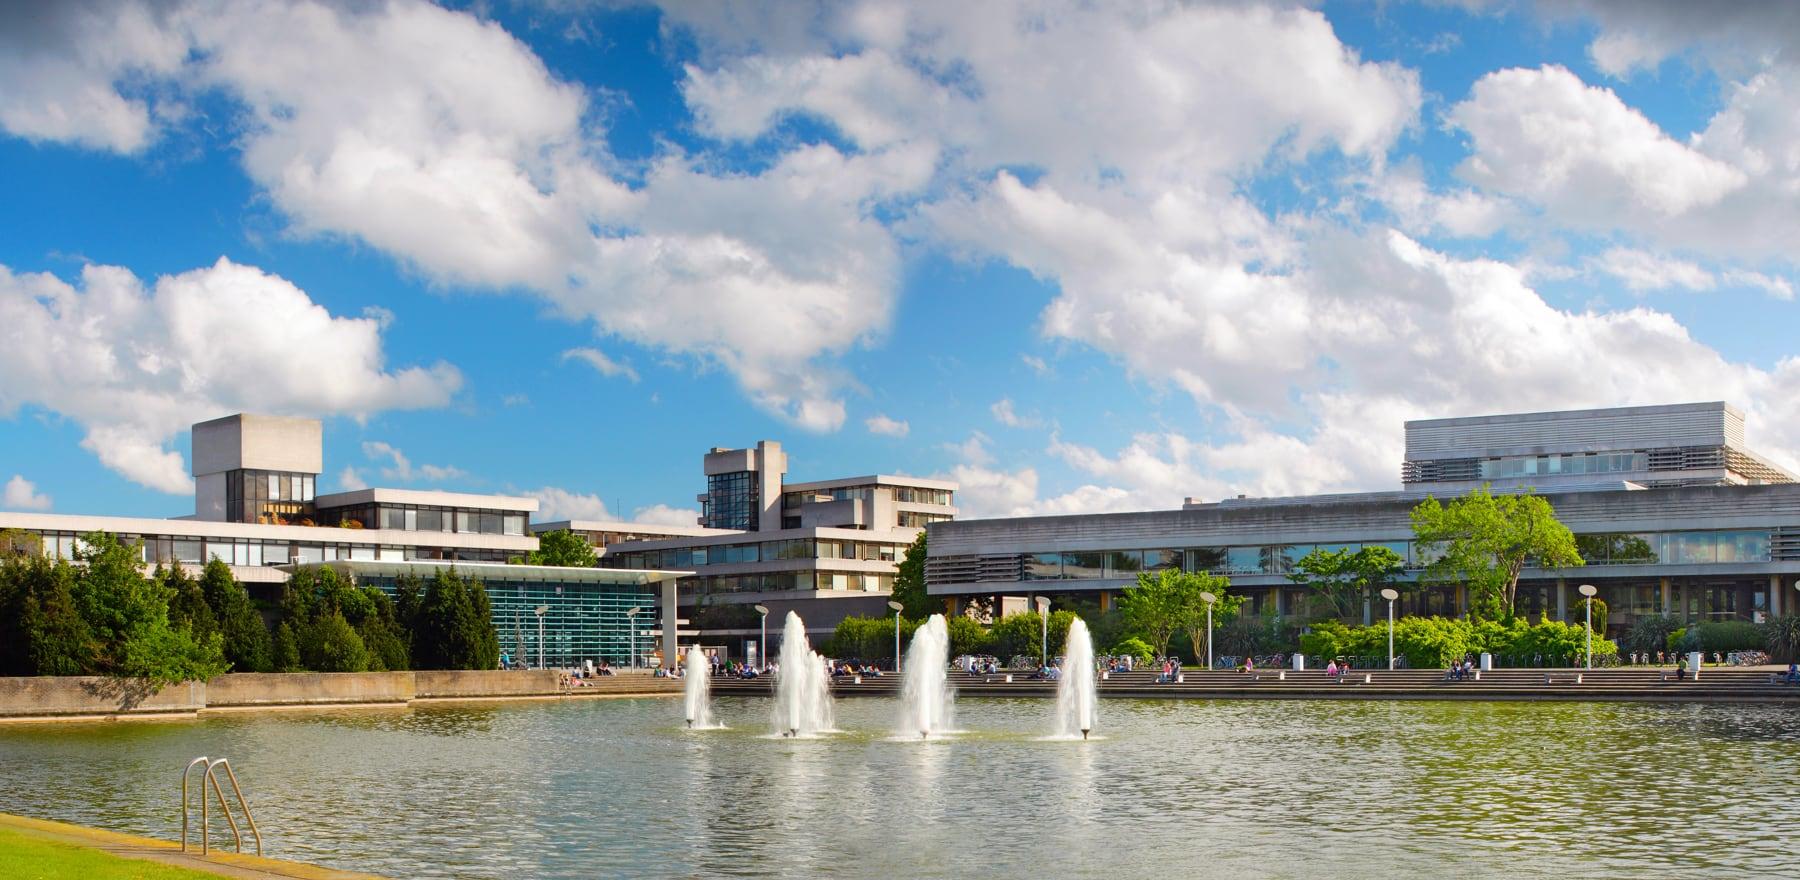 Univeristas terbaik Irlandia  - University College Dublin